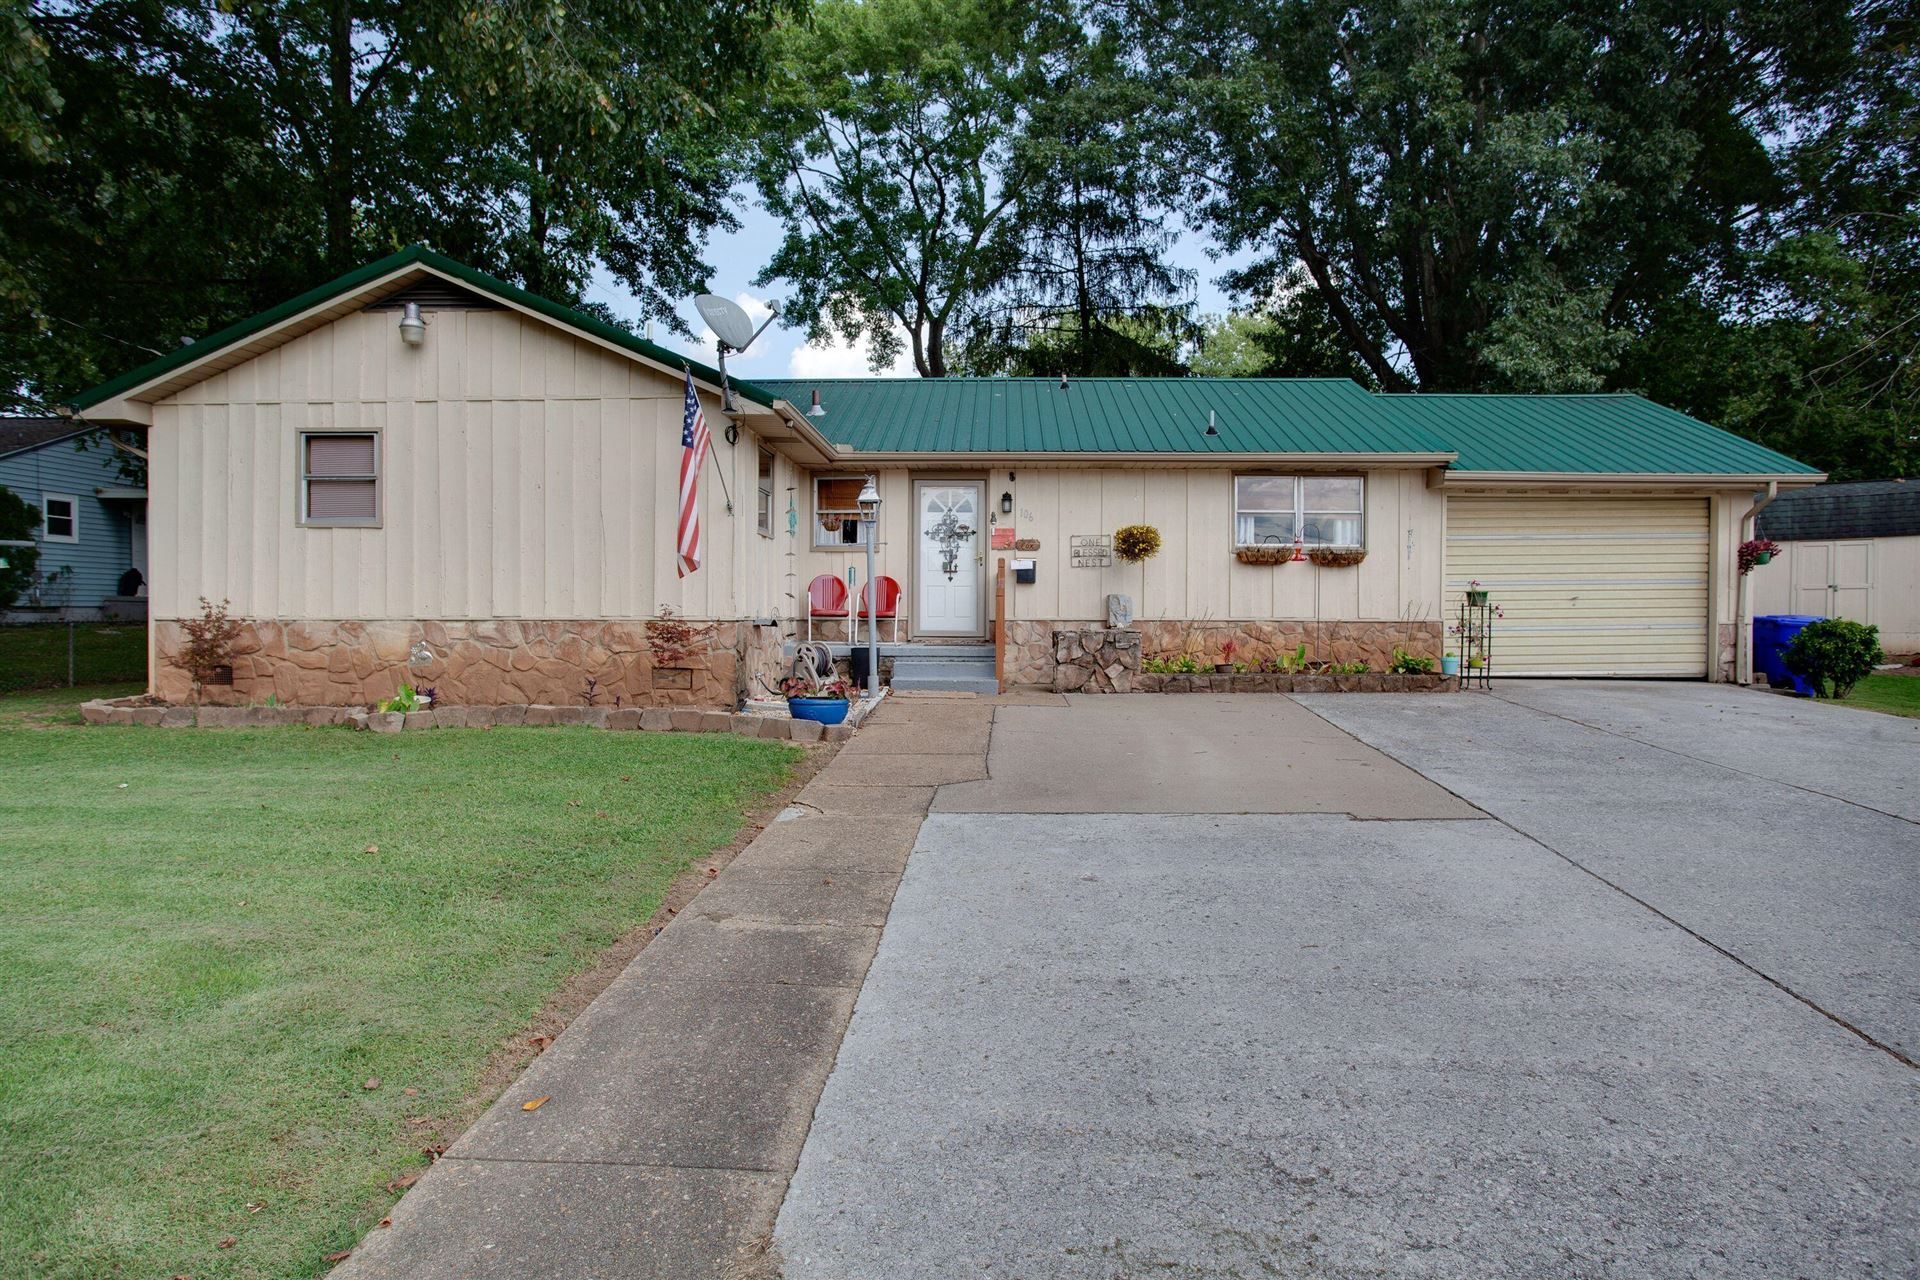 Photo of 106 Phillips Lane, Oak Ridge, TN 37830 (MLS # 1167397)